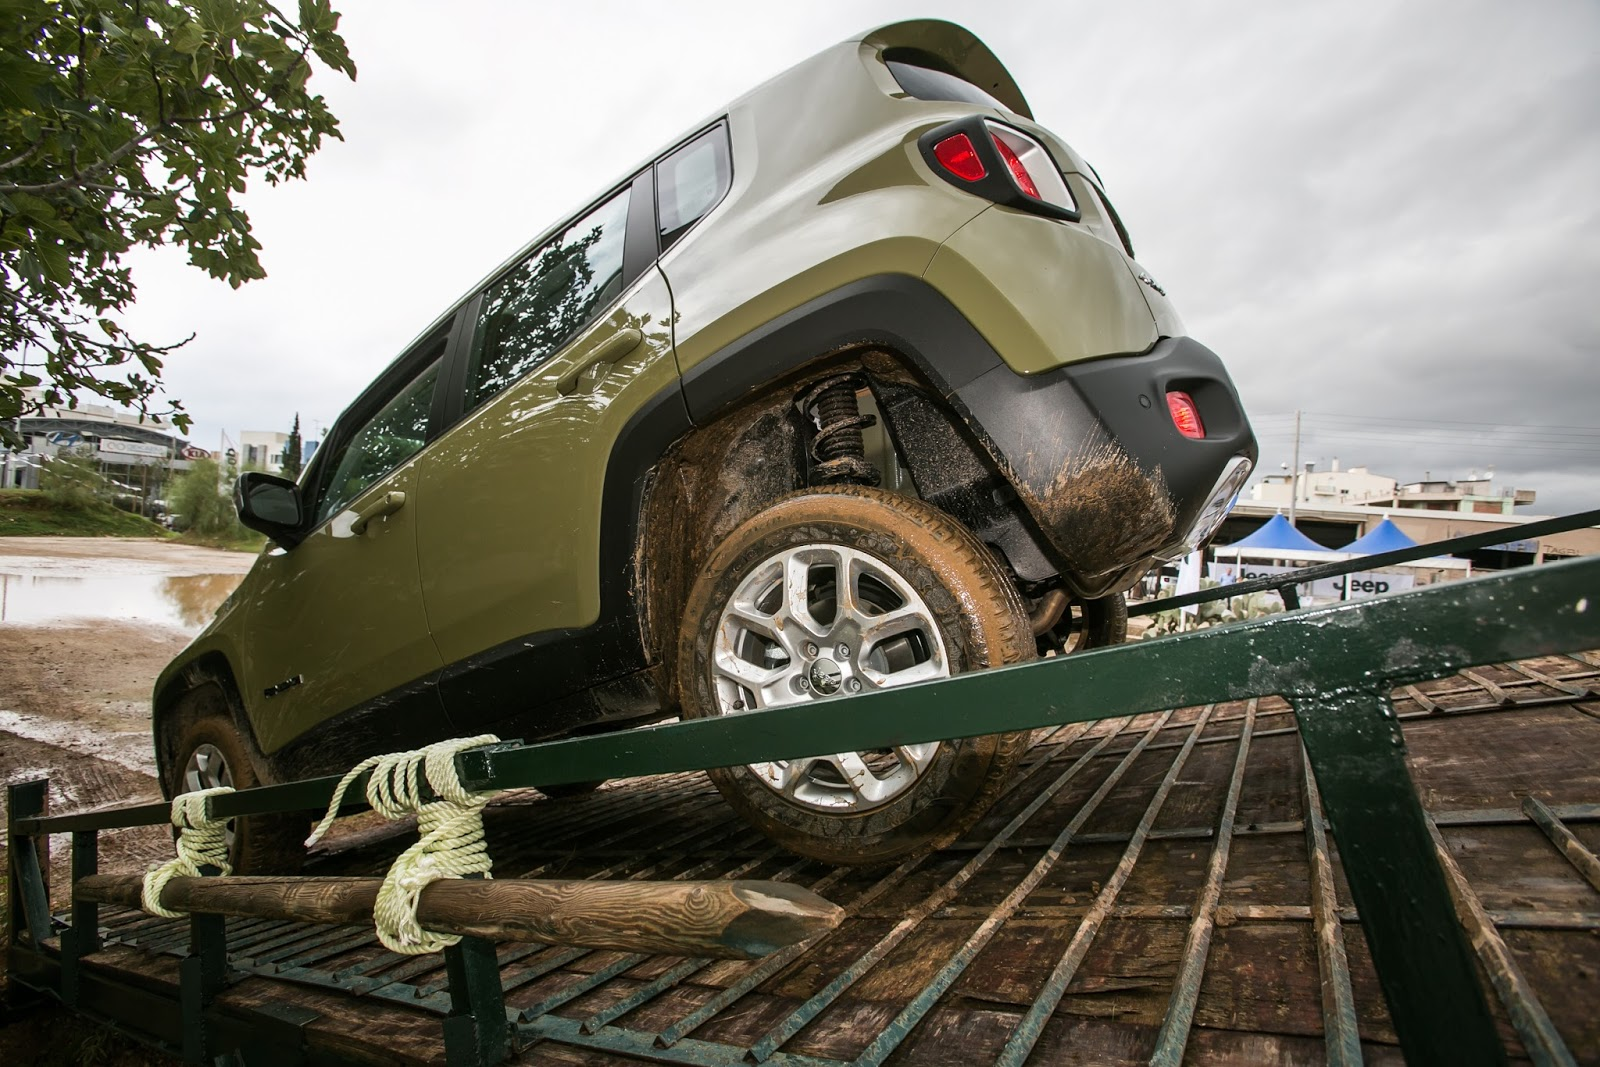 JEEP%2BCAMP GK 0414 Πετάμε ένα Jeep Renegade σε λάσπες, πέτρες, άμμο, λίμνες. Θα τα καταφέρει;